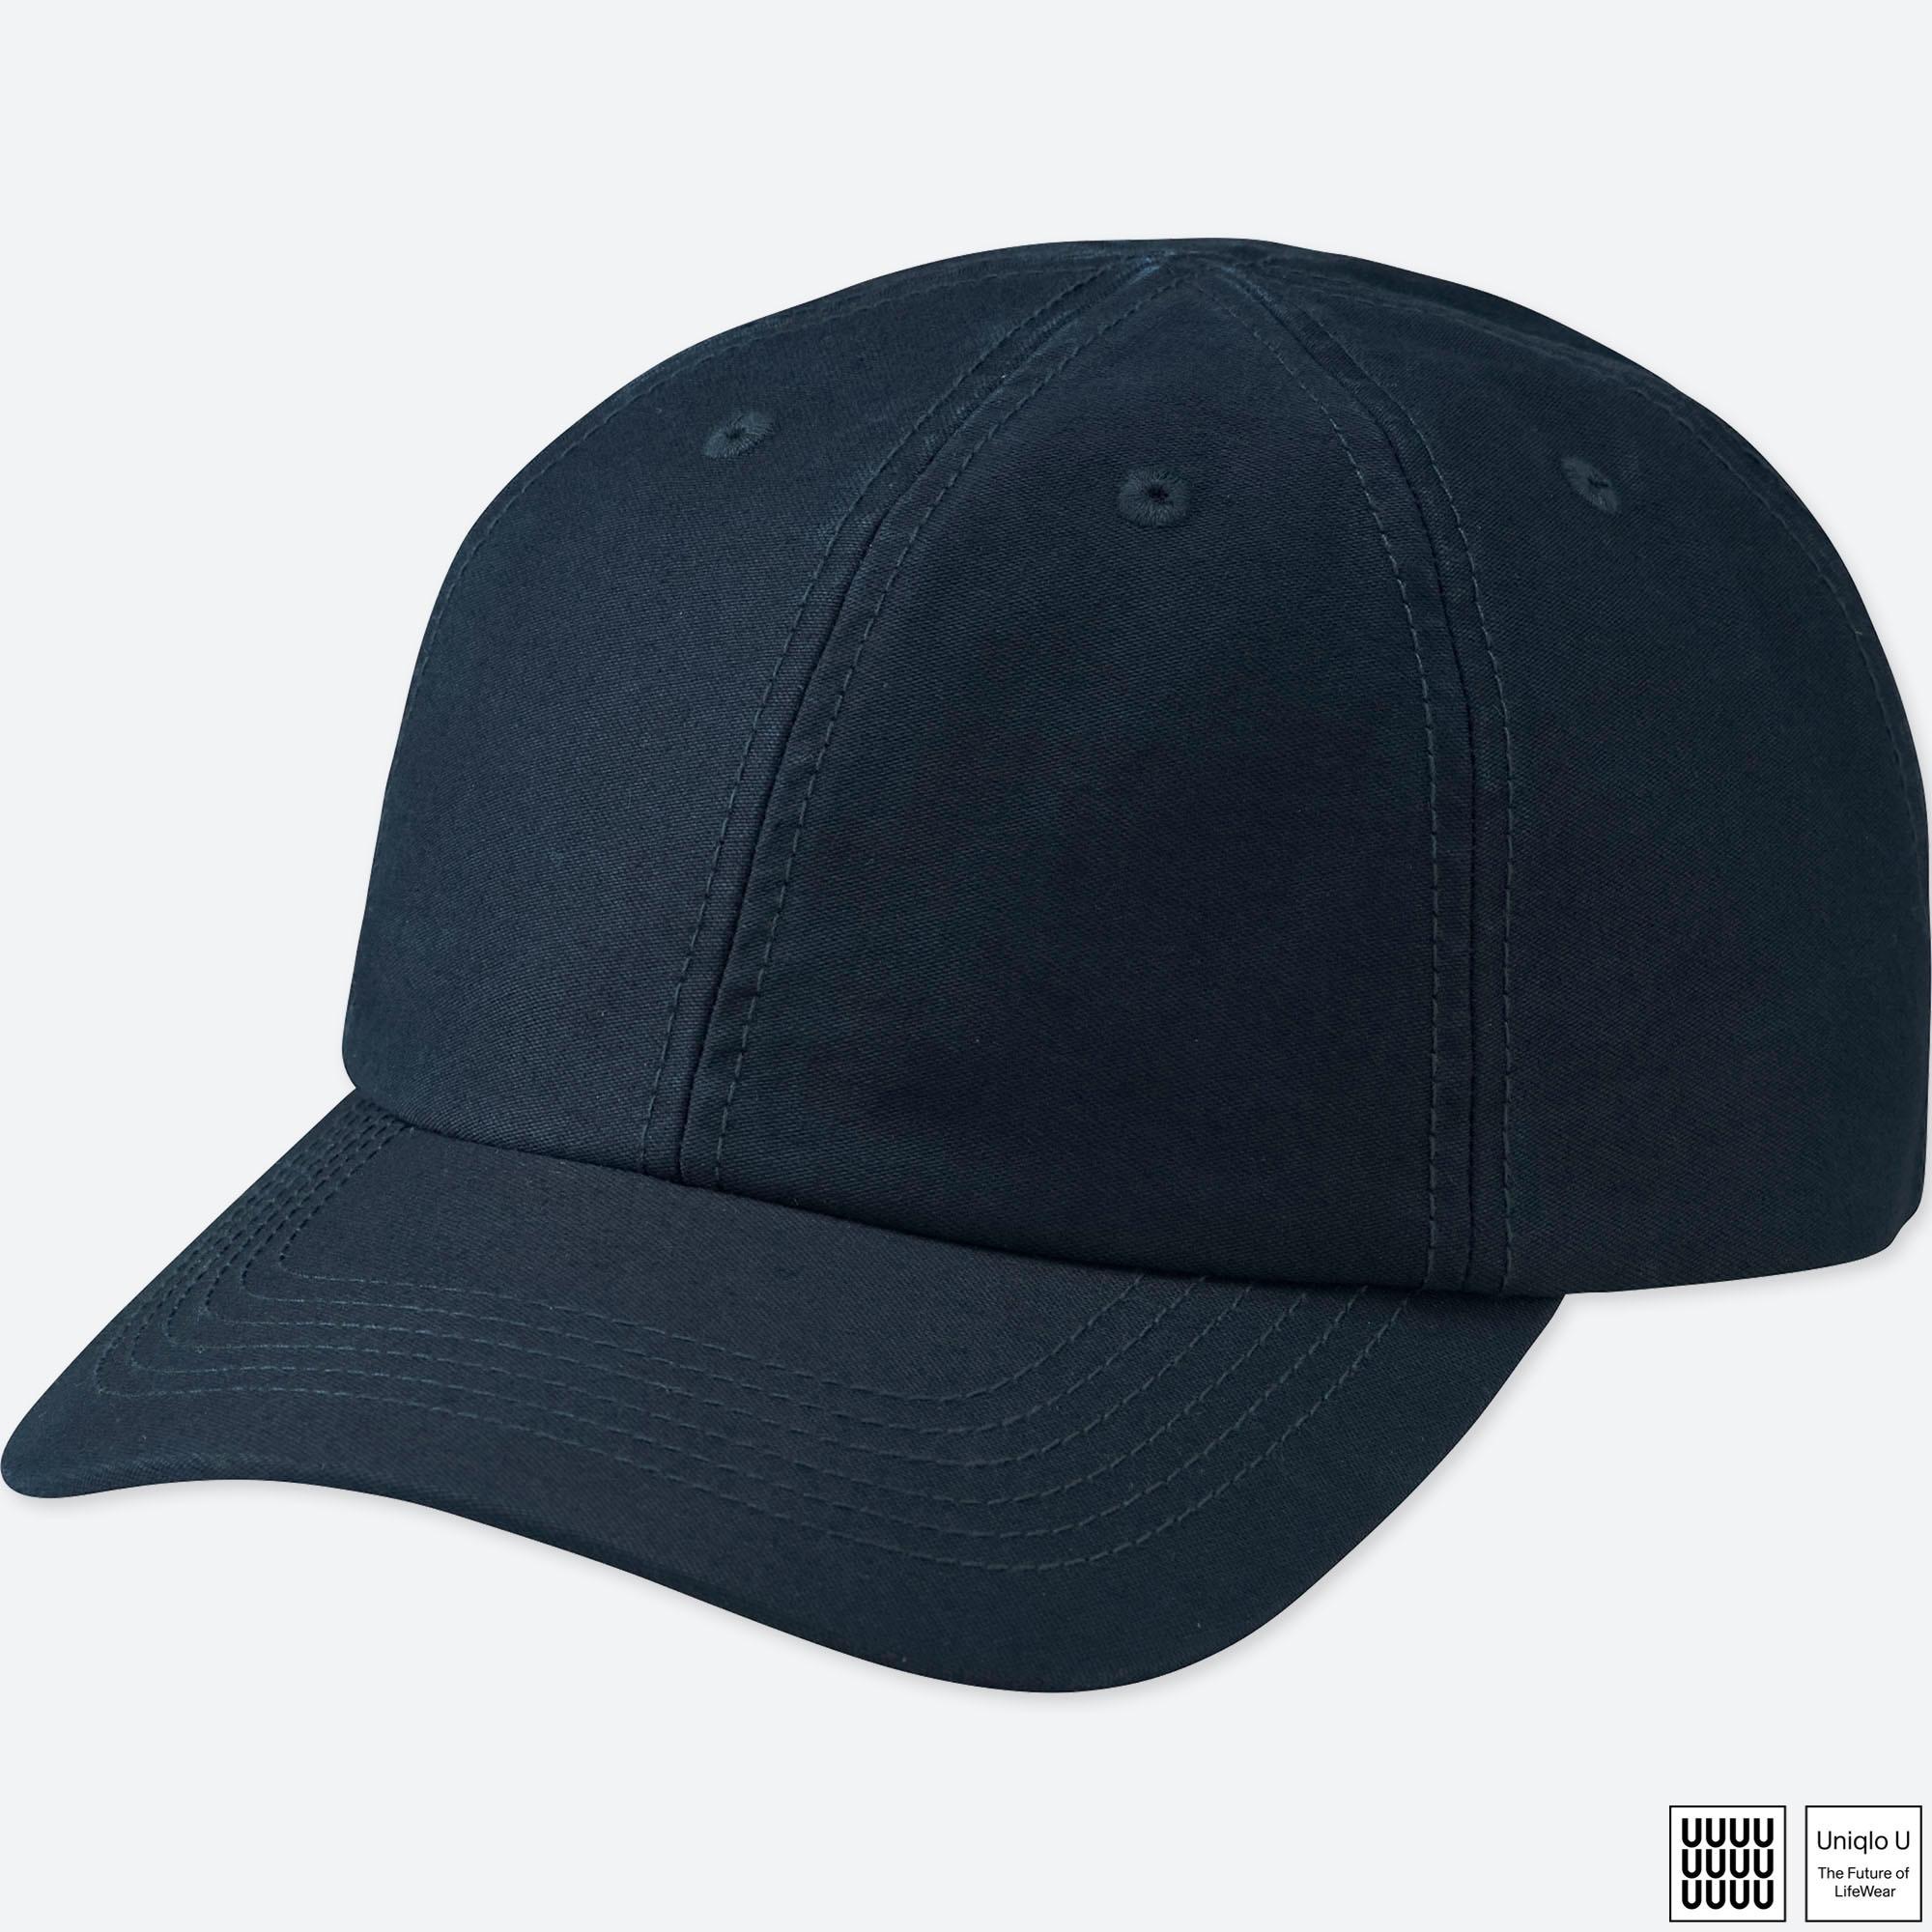 aeb2f9343 U BASEBALL CAP